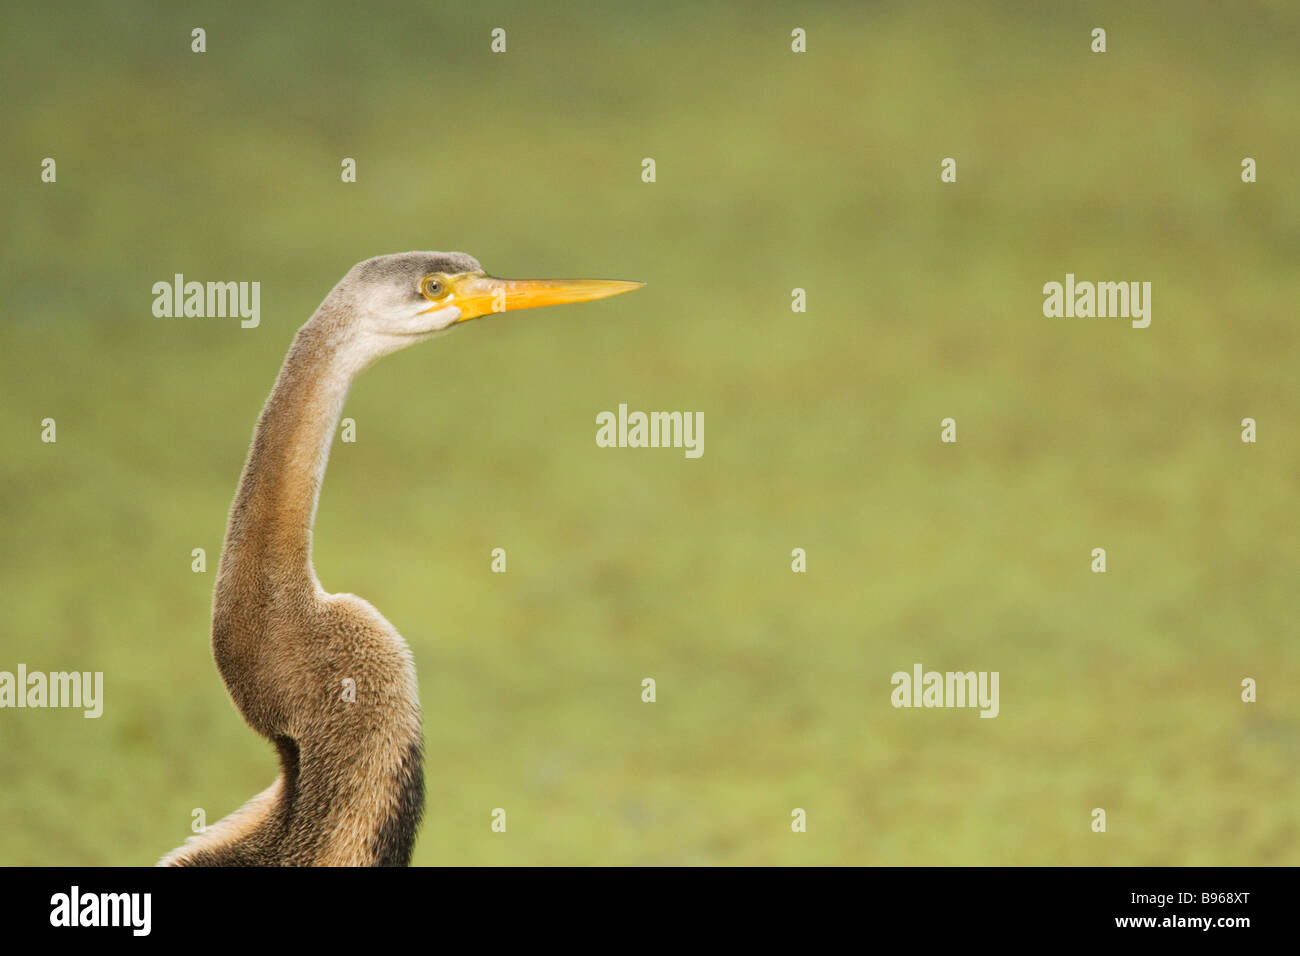 Indian Darter - Close up (Snakebird, Anhinga) Anhinga melanogaster Keoladeo Ghana National Park Bharatpur, India - Stock Image